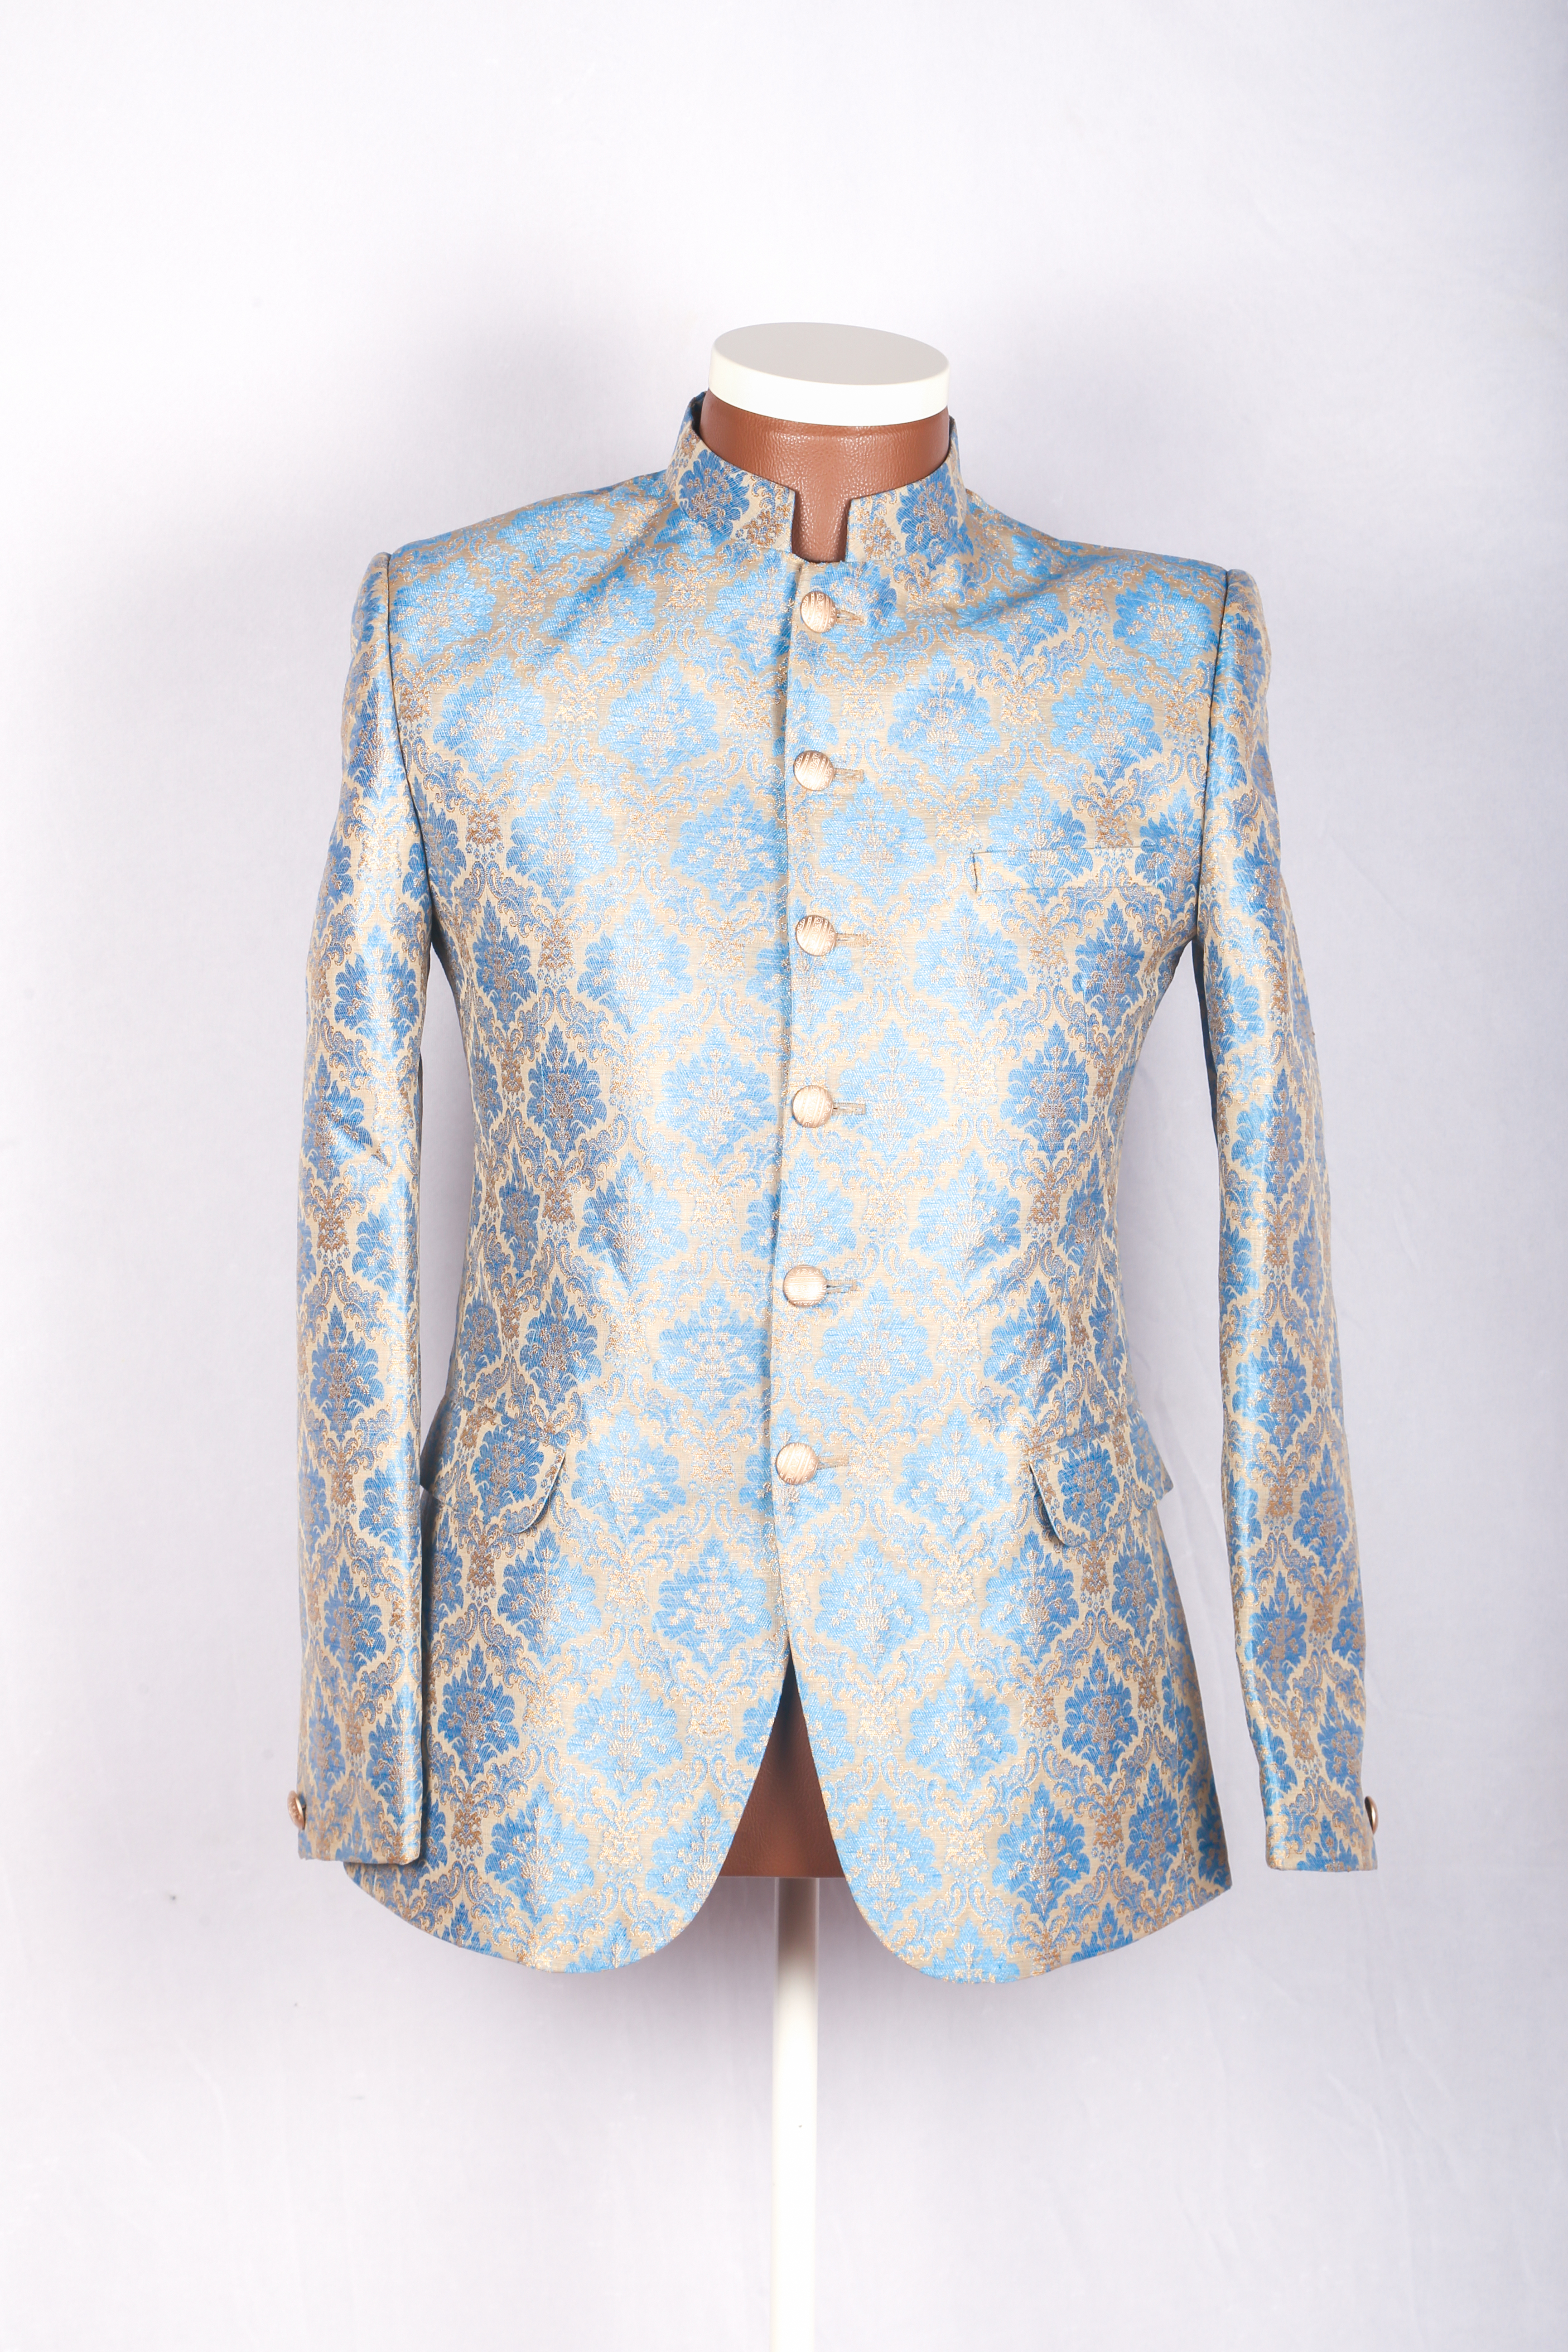 Ethnix by Raymond | Ethnix by Raymond Light Blue Jacket